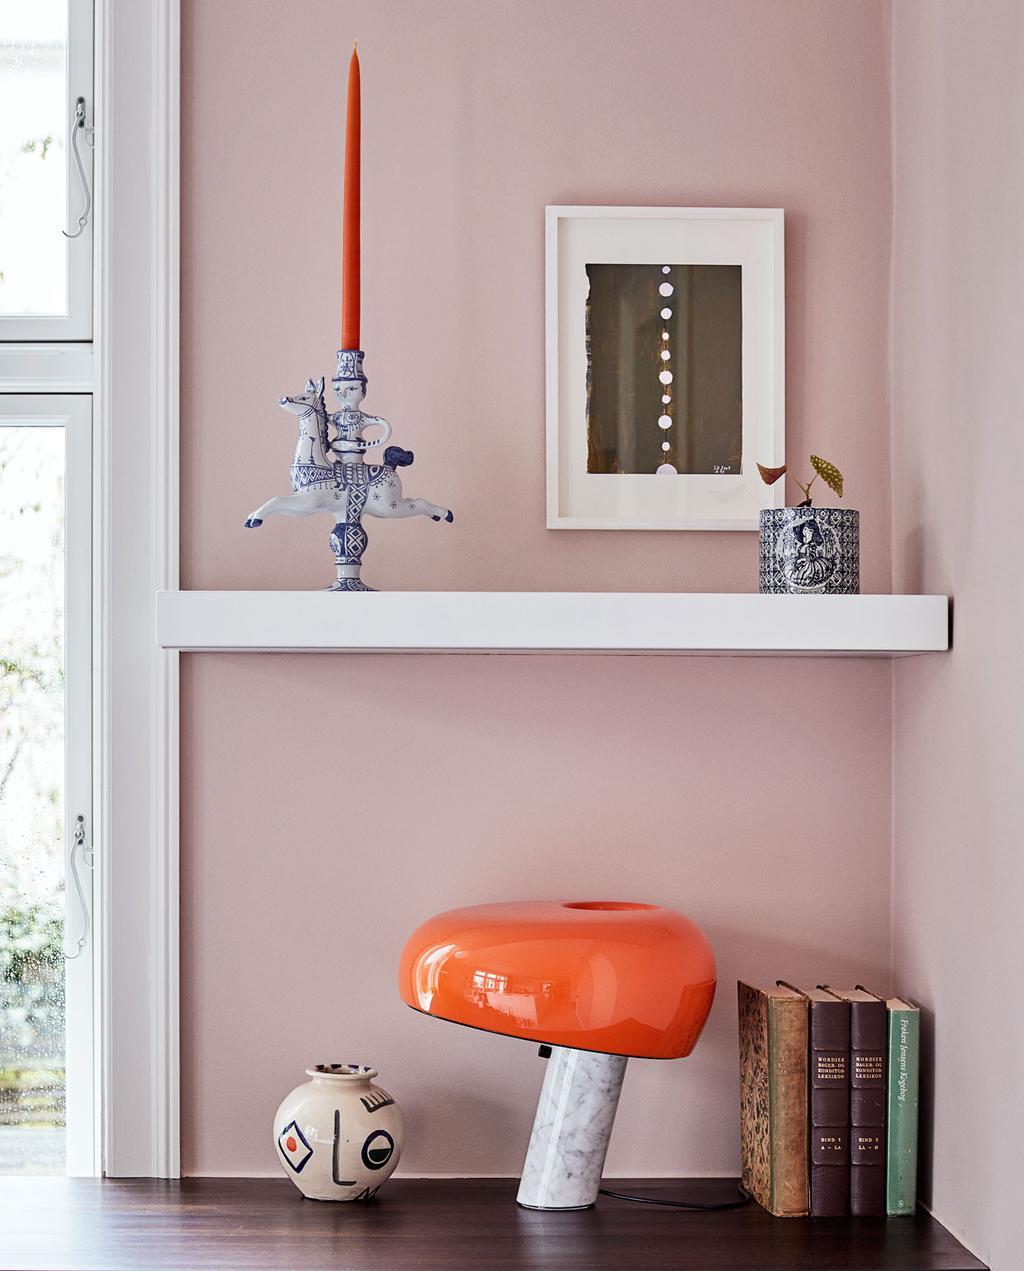 vtwonen 10-2019 | accessoires oranje tinten